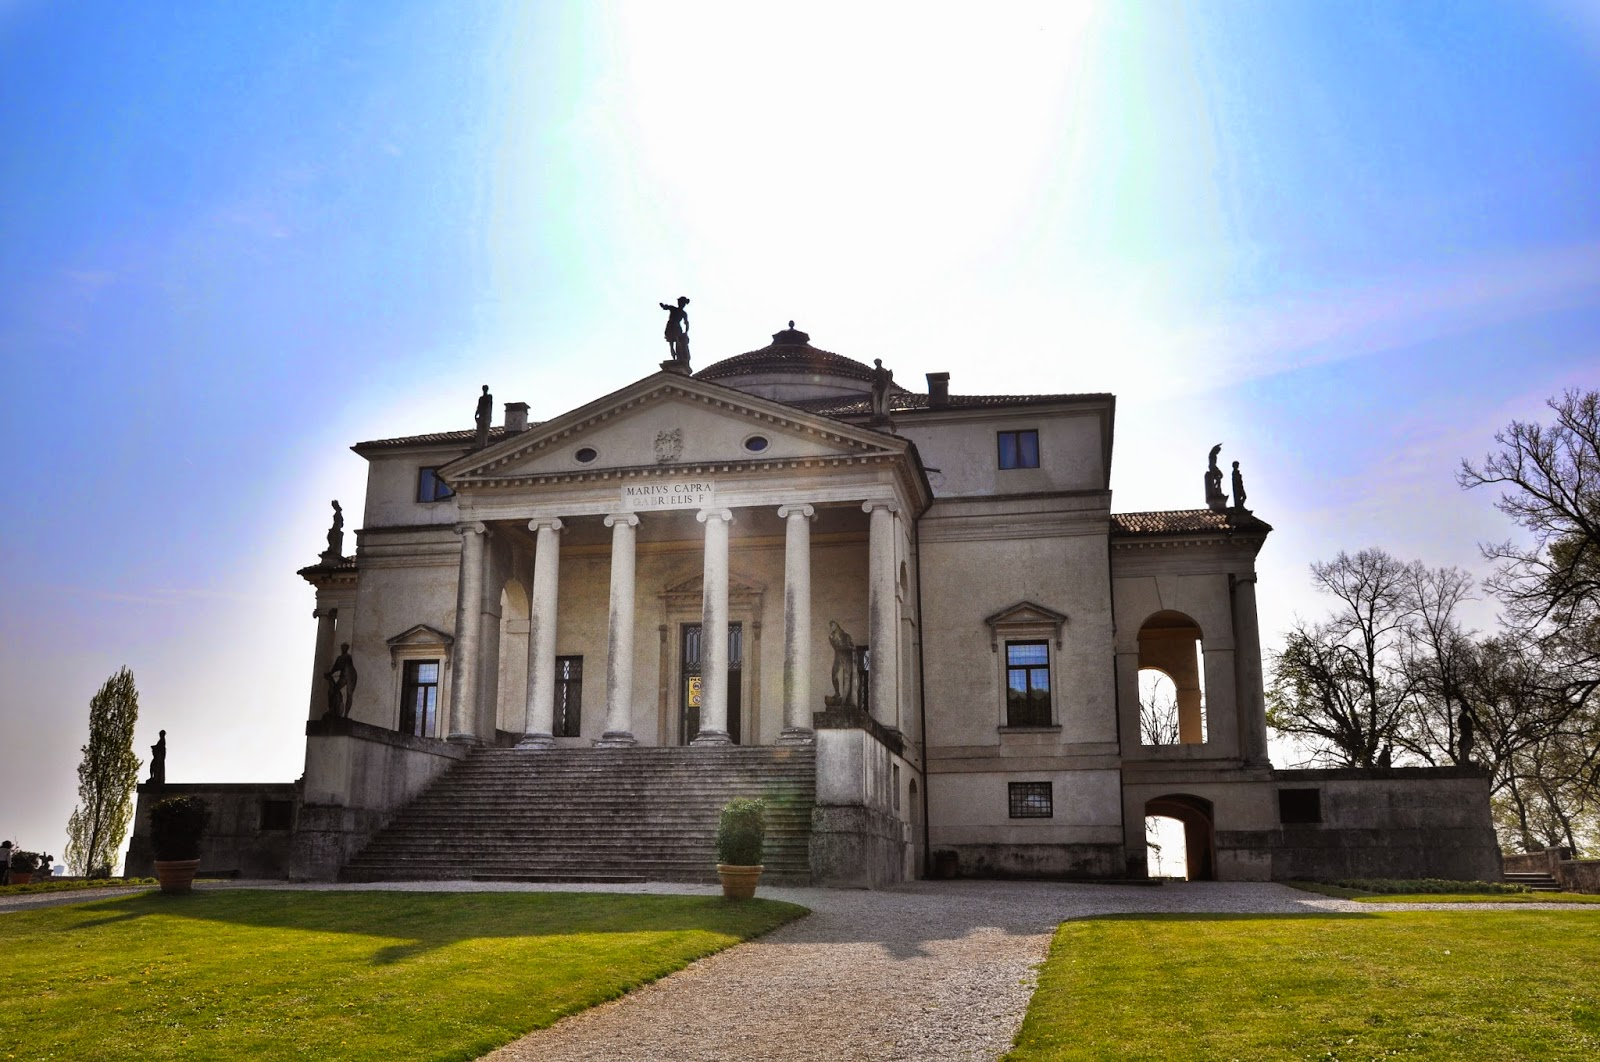 Villa Capra La Rotonda, Vicenza, Italy